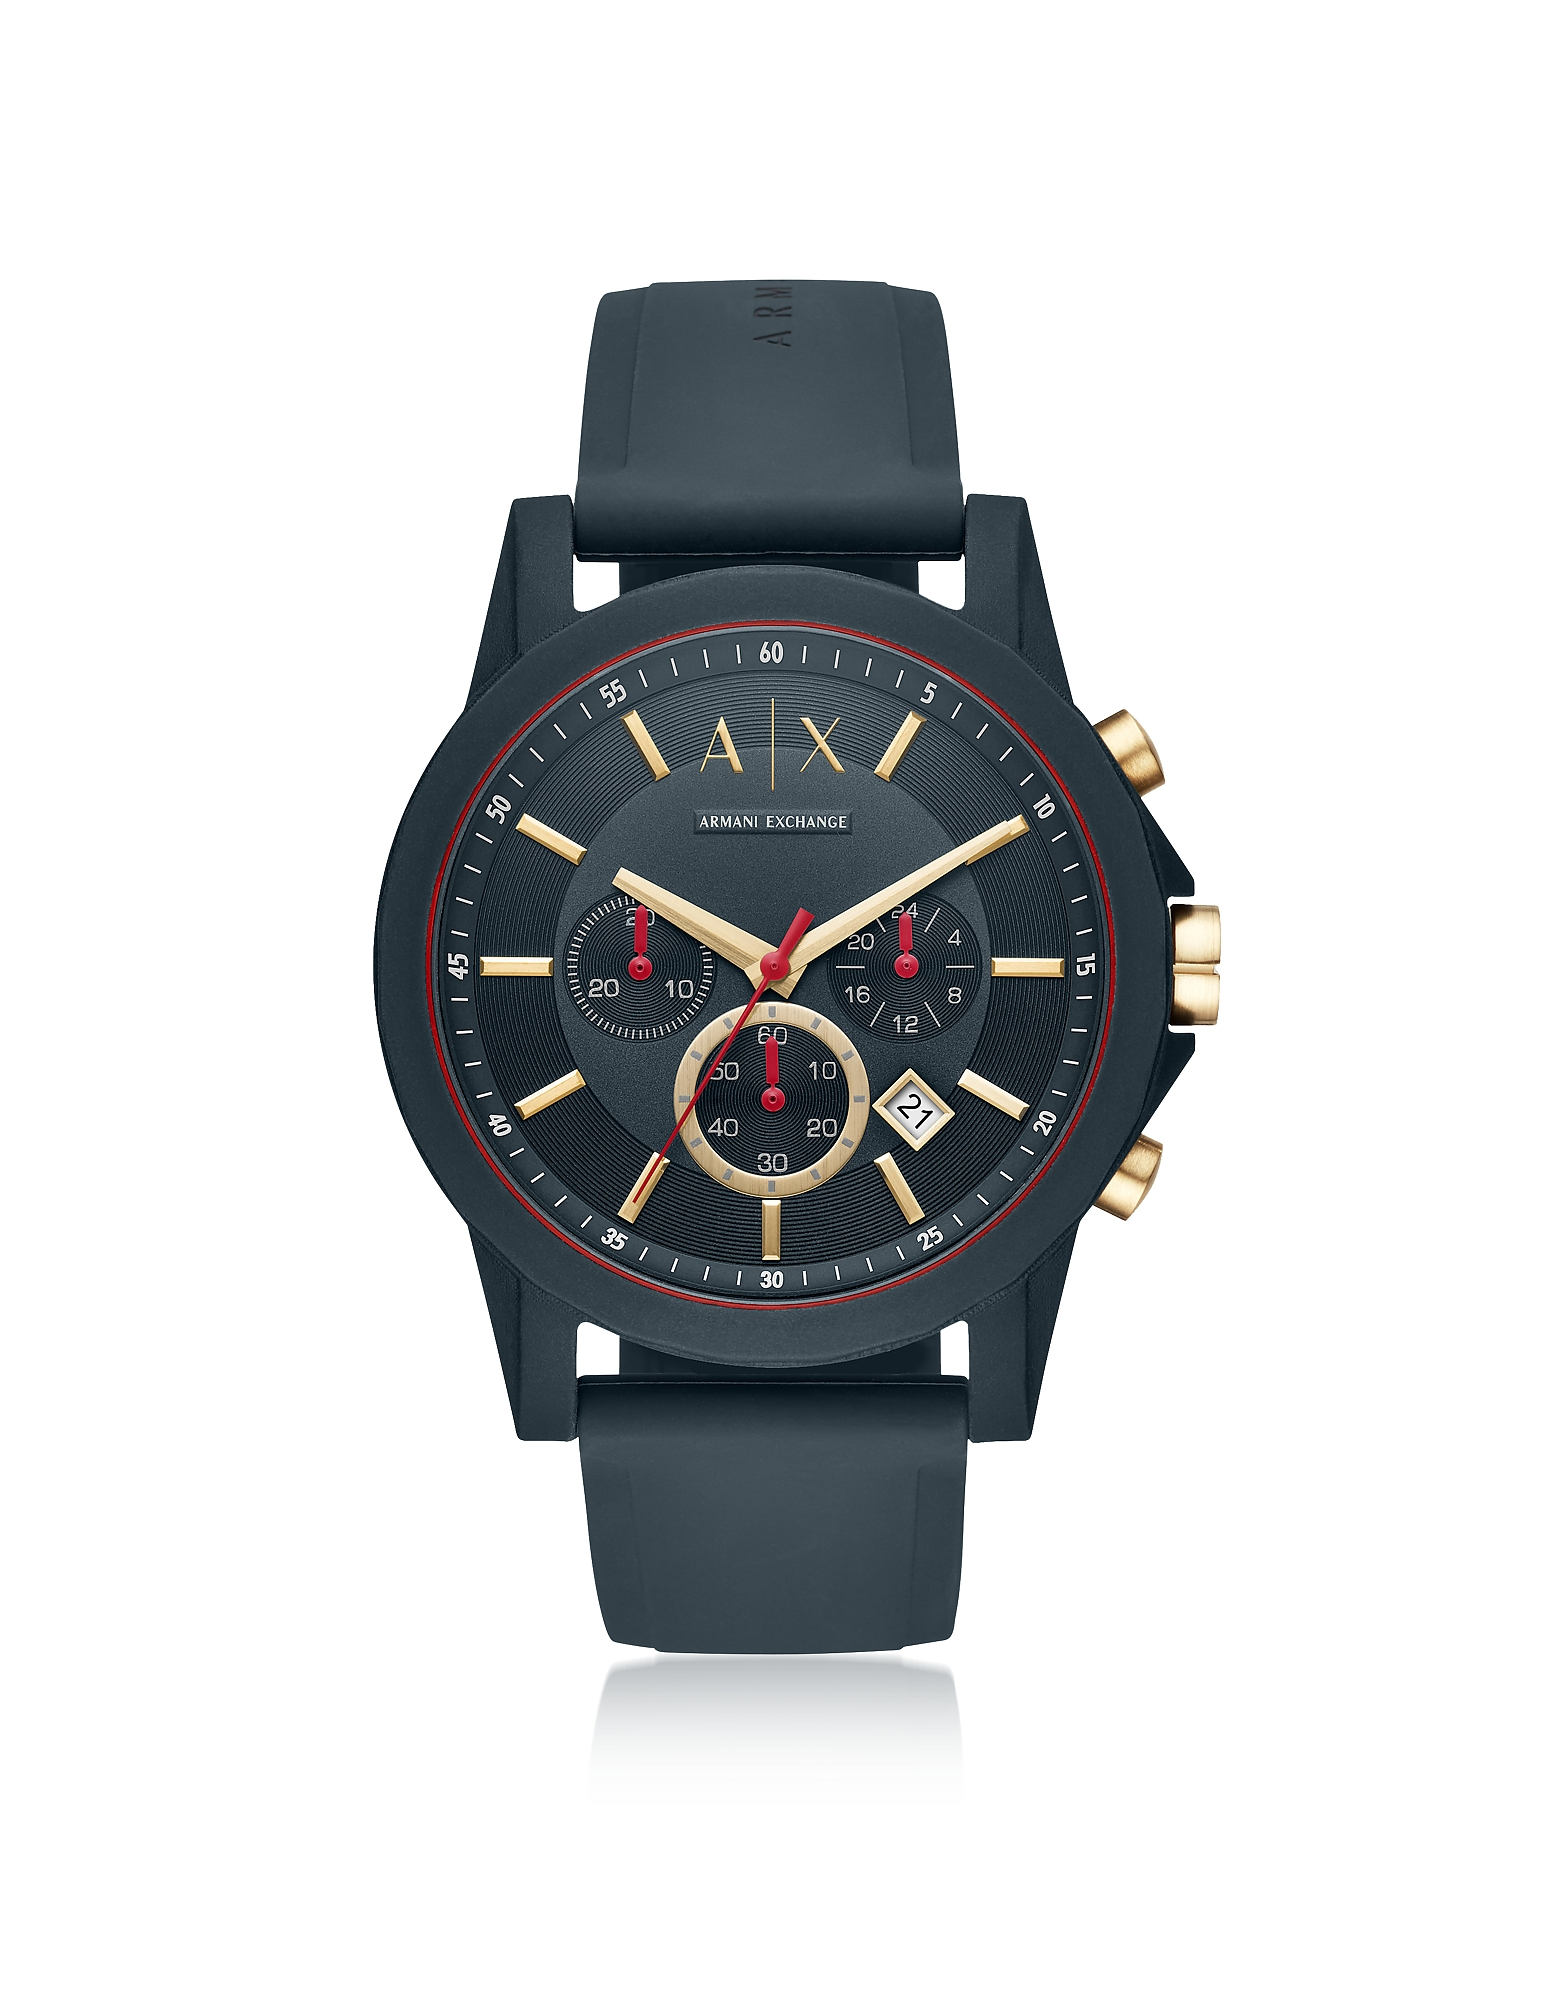 Armani Exchange Men's Watches, AIX Blue Silicone Men's Chronograph Watch